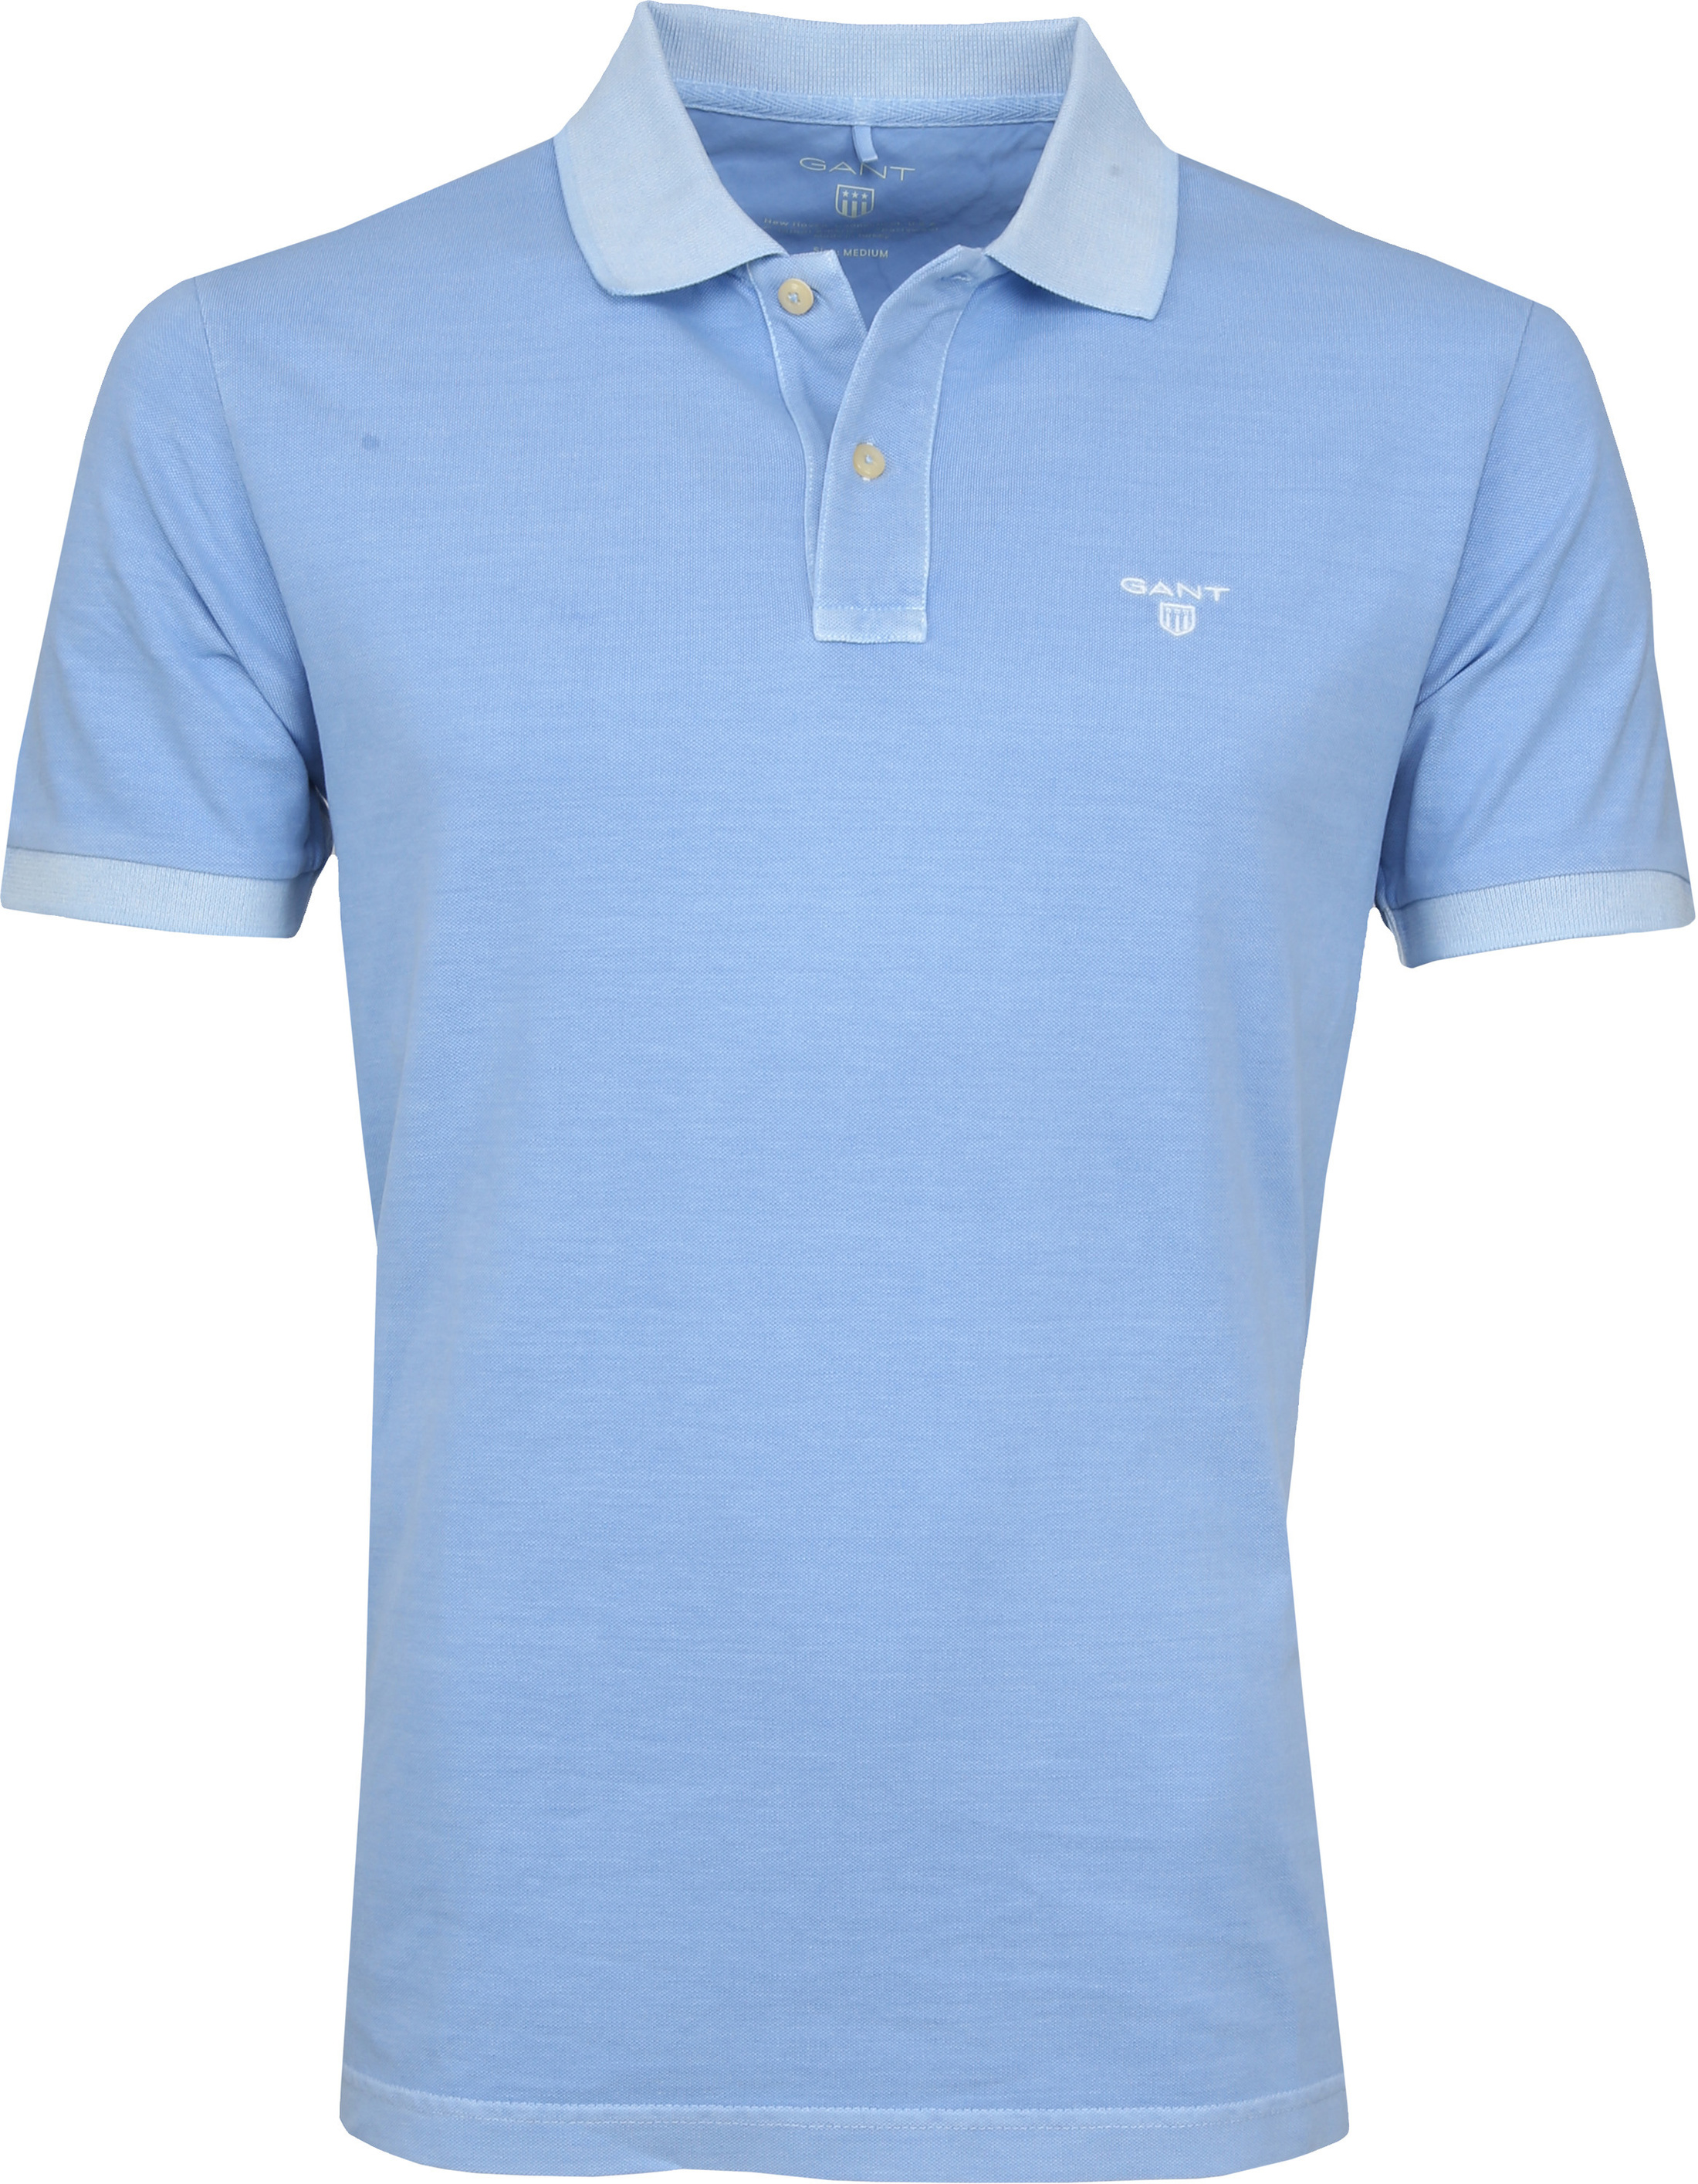 Gant Poloshirt Sunbleached Lichtblauw